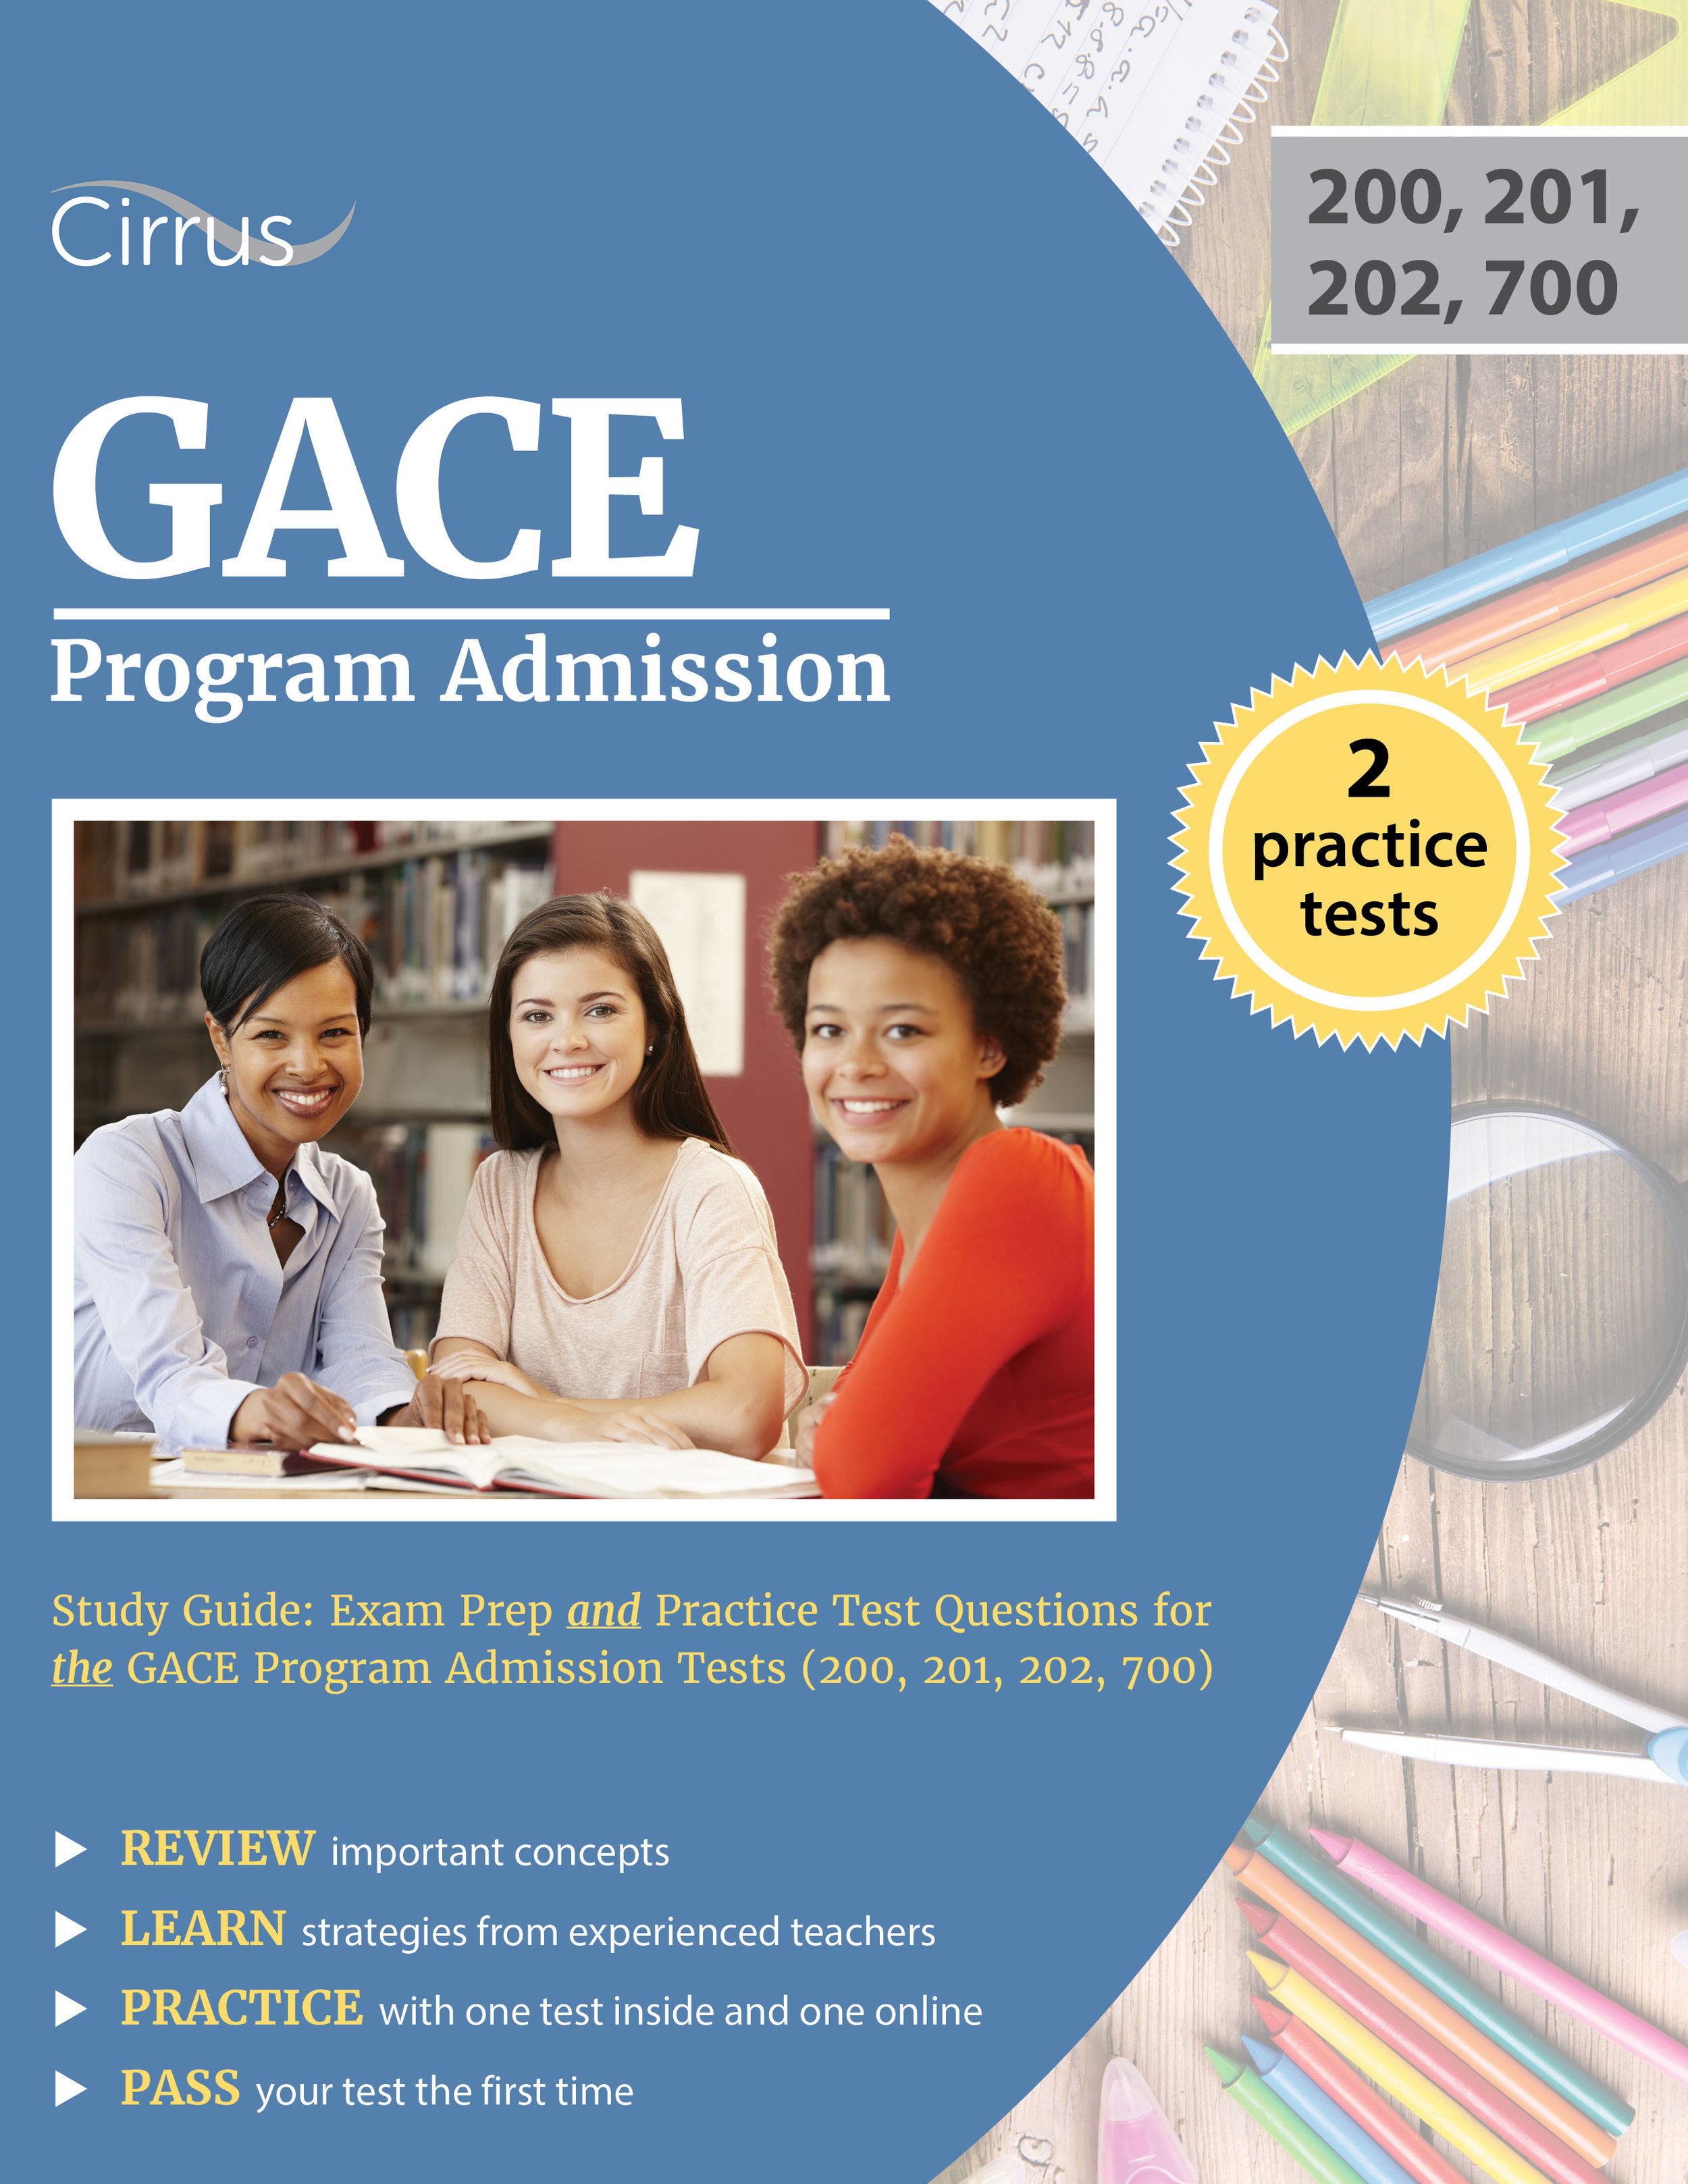 GACE Program Admission